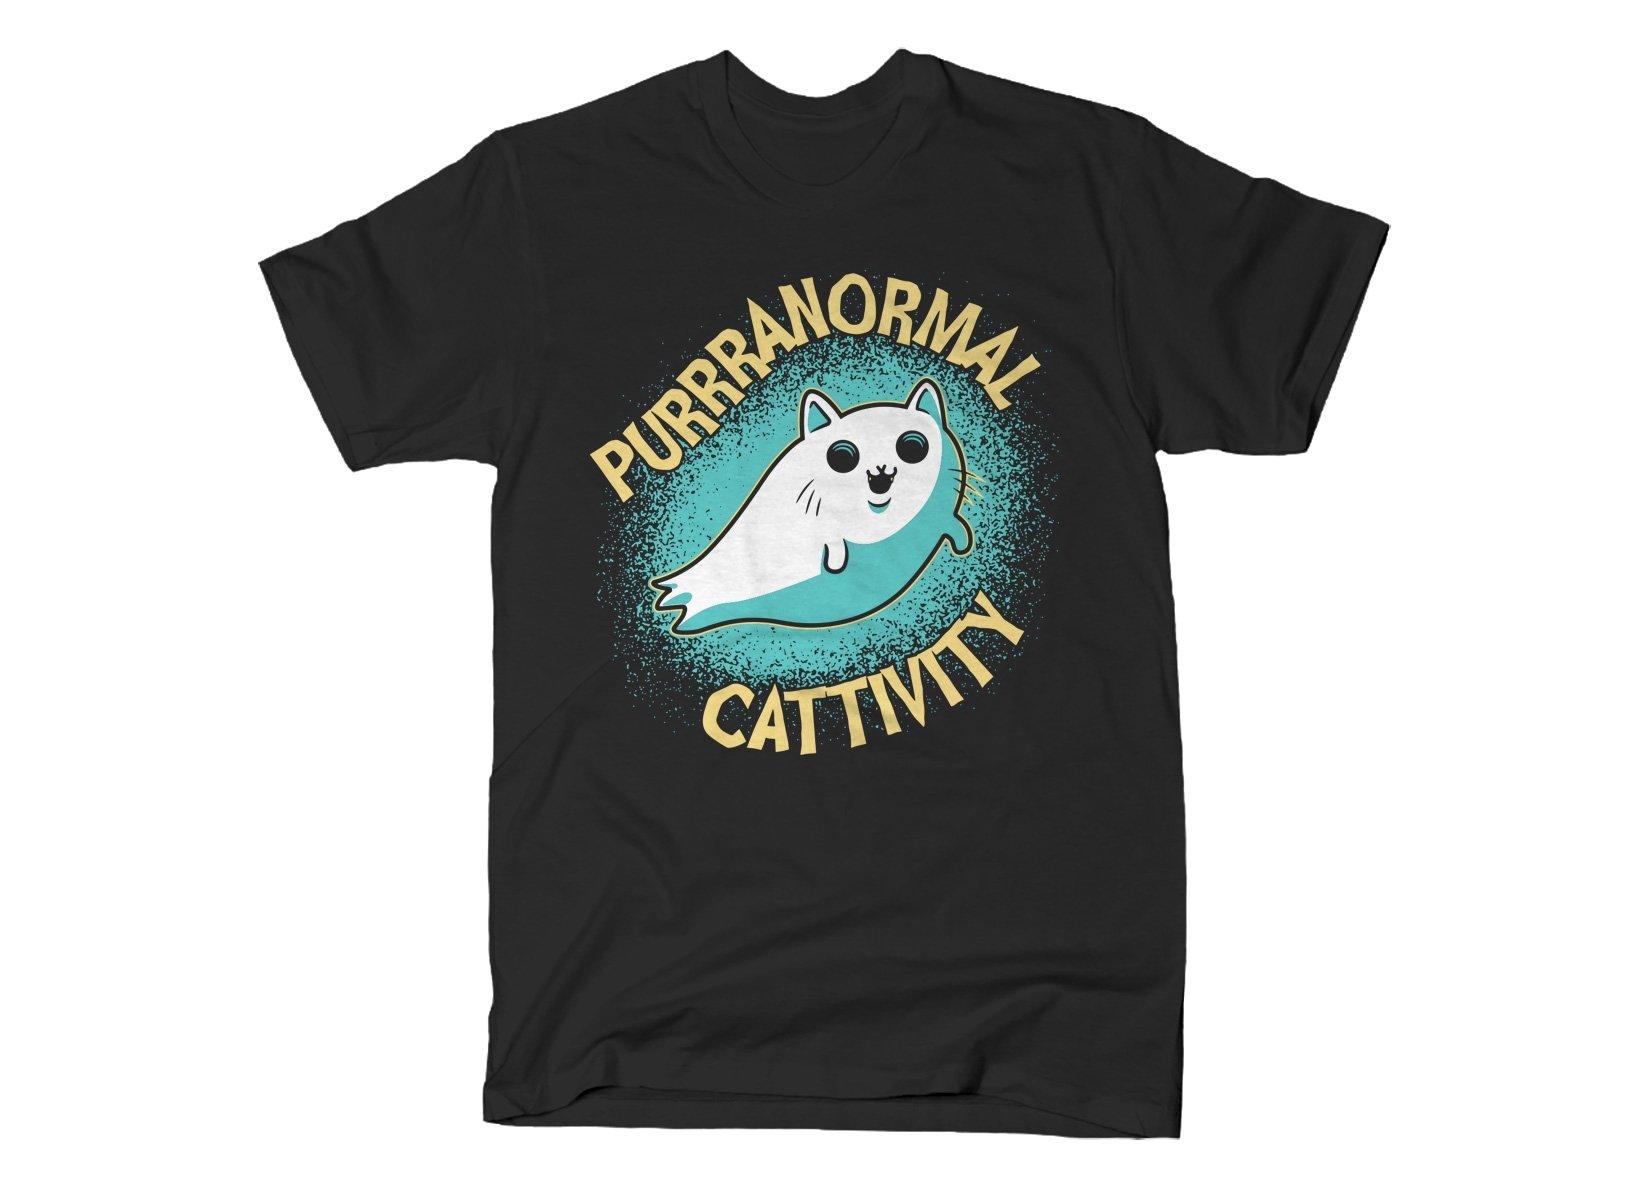 Purrranormal Cattivity on Mens T-Shirt